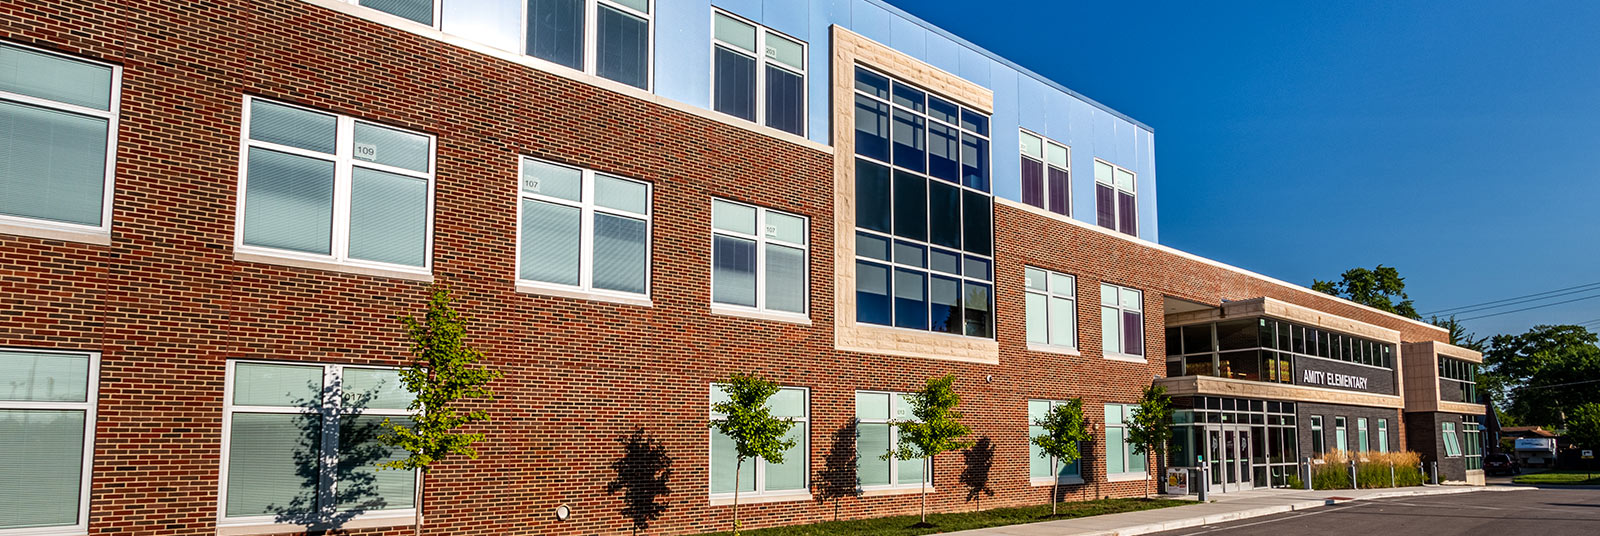 Exterior of Amity Elementary in Deer Park, Ohio.